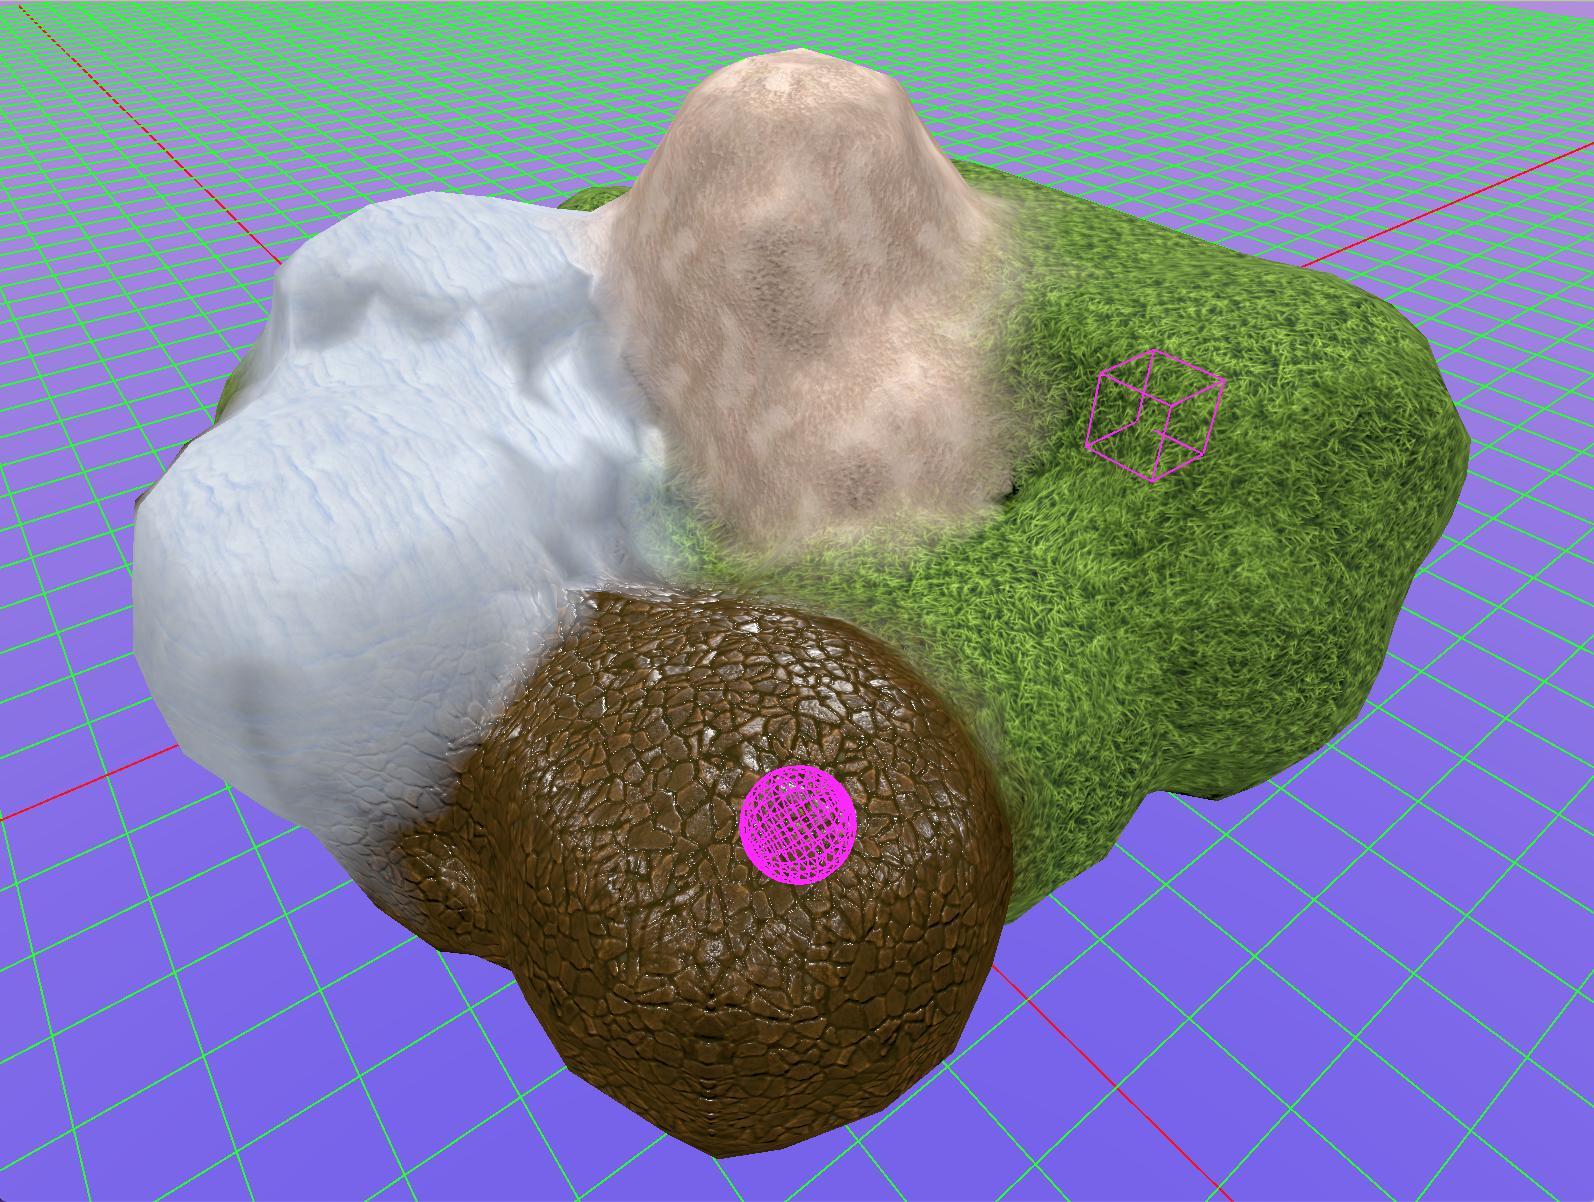 Demo: some terrain painted as grass, snow, dirt, etc